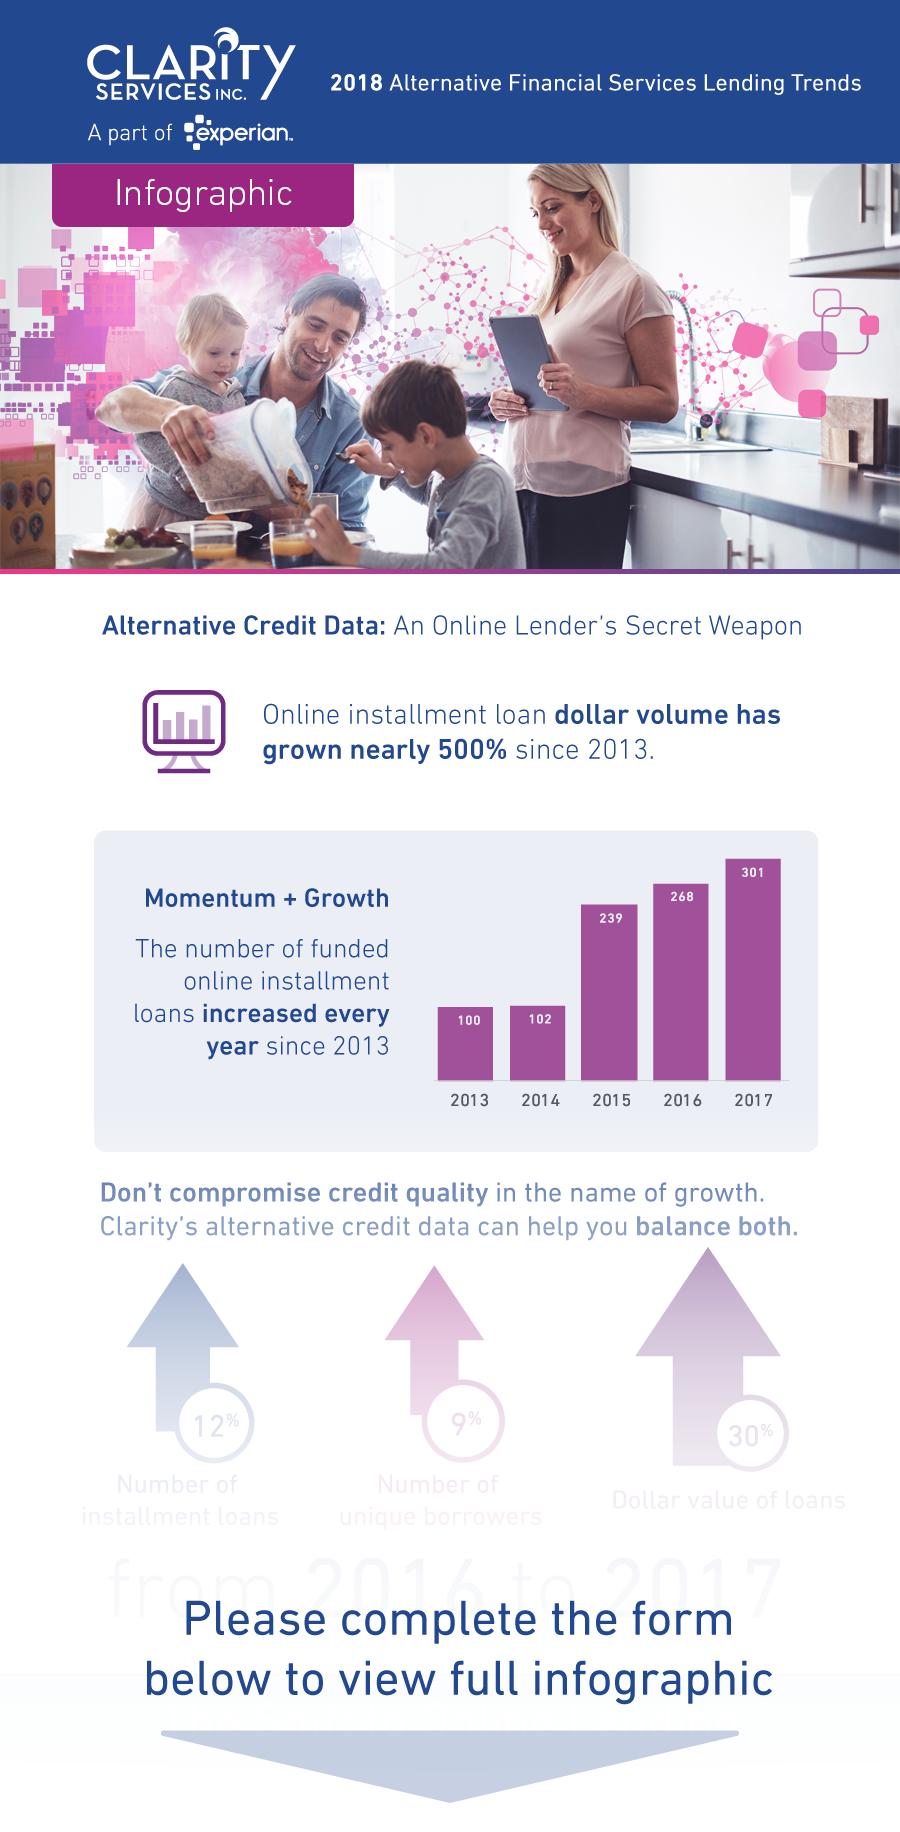 2018 Online Lending Trends Infographic